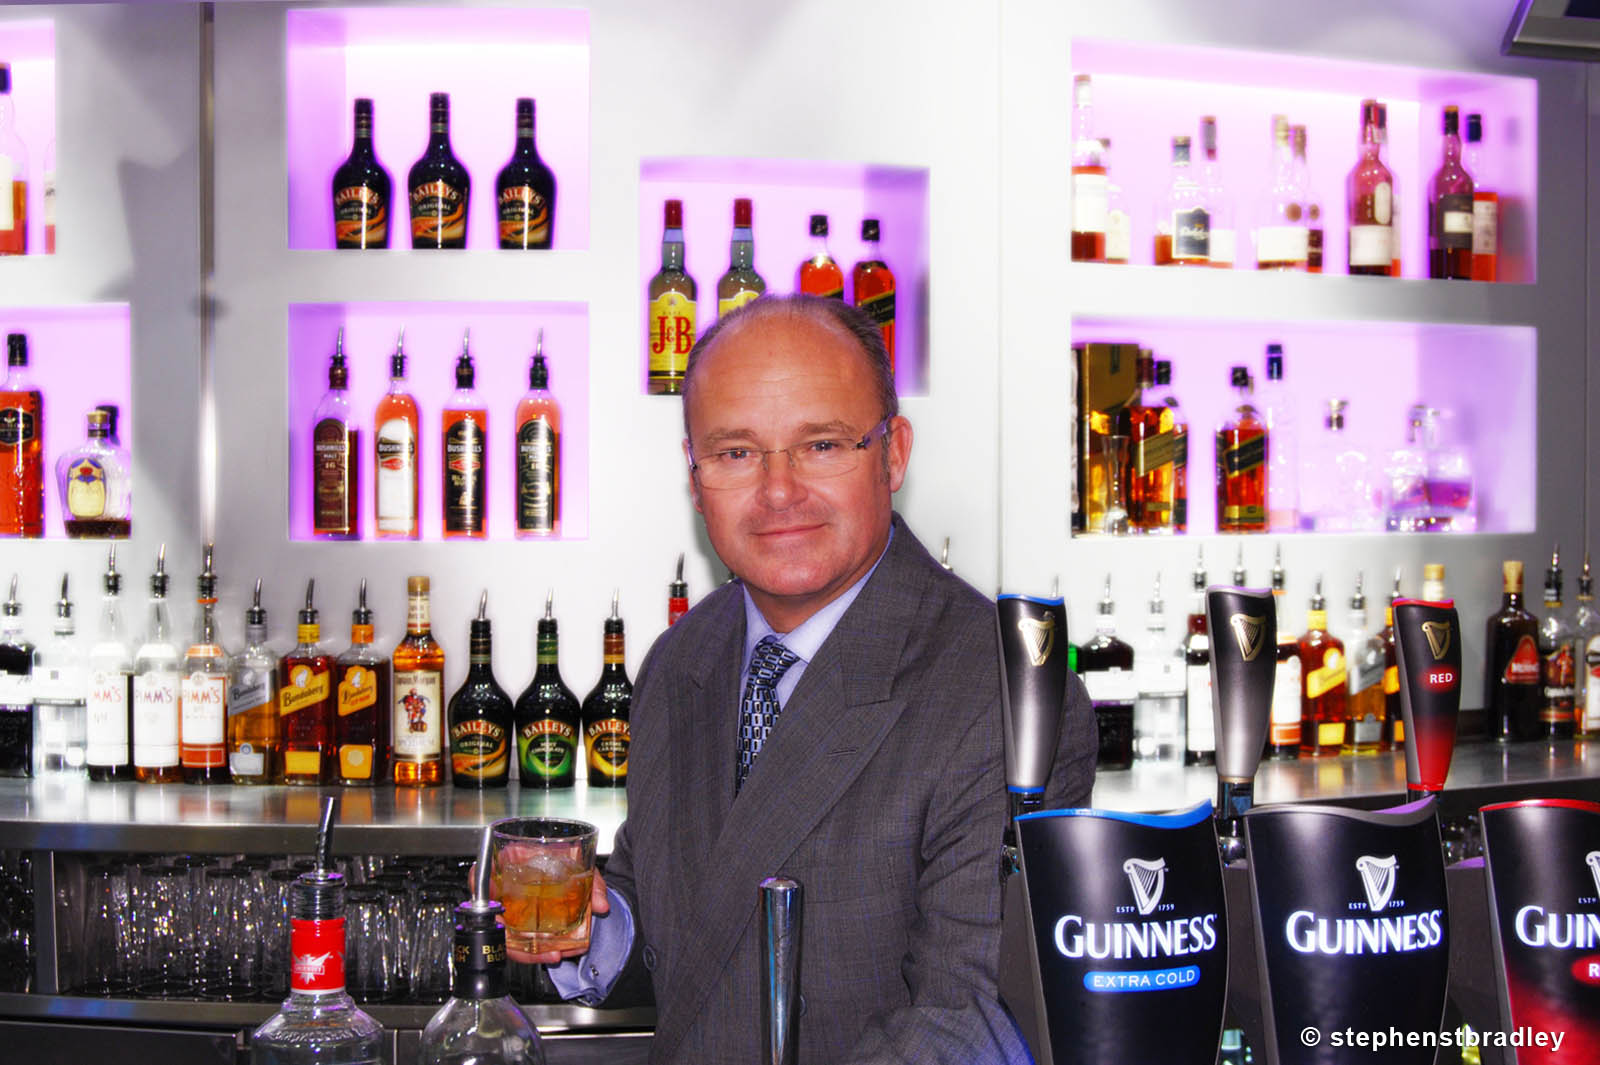 PR Photographer Dublin Ireland portfolio photo of former Diageo CEO Paul Walsh - photo 2262 by Stephen T Bradley PR photography and video production services Dublin, Ireland